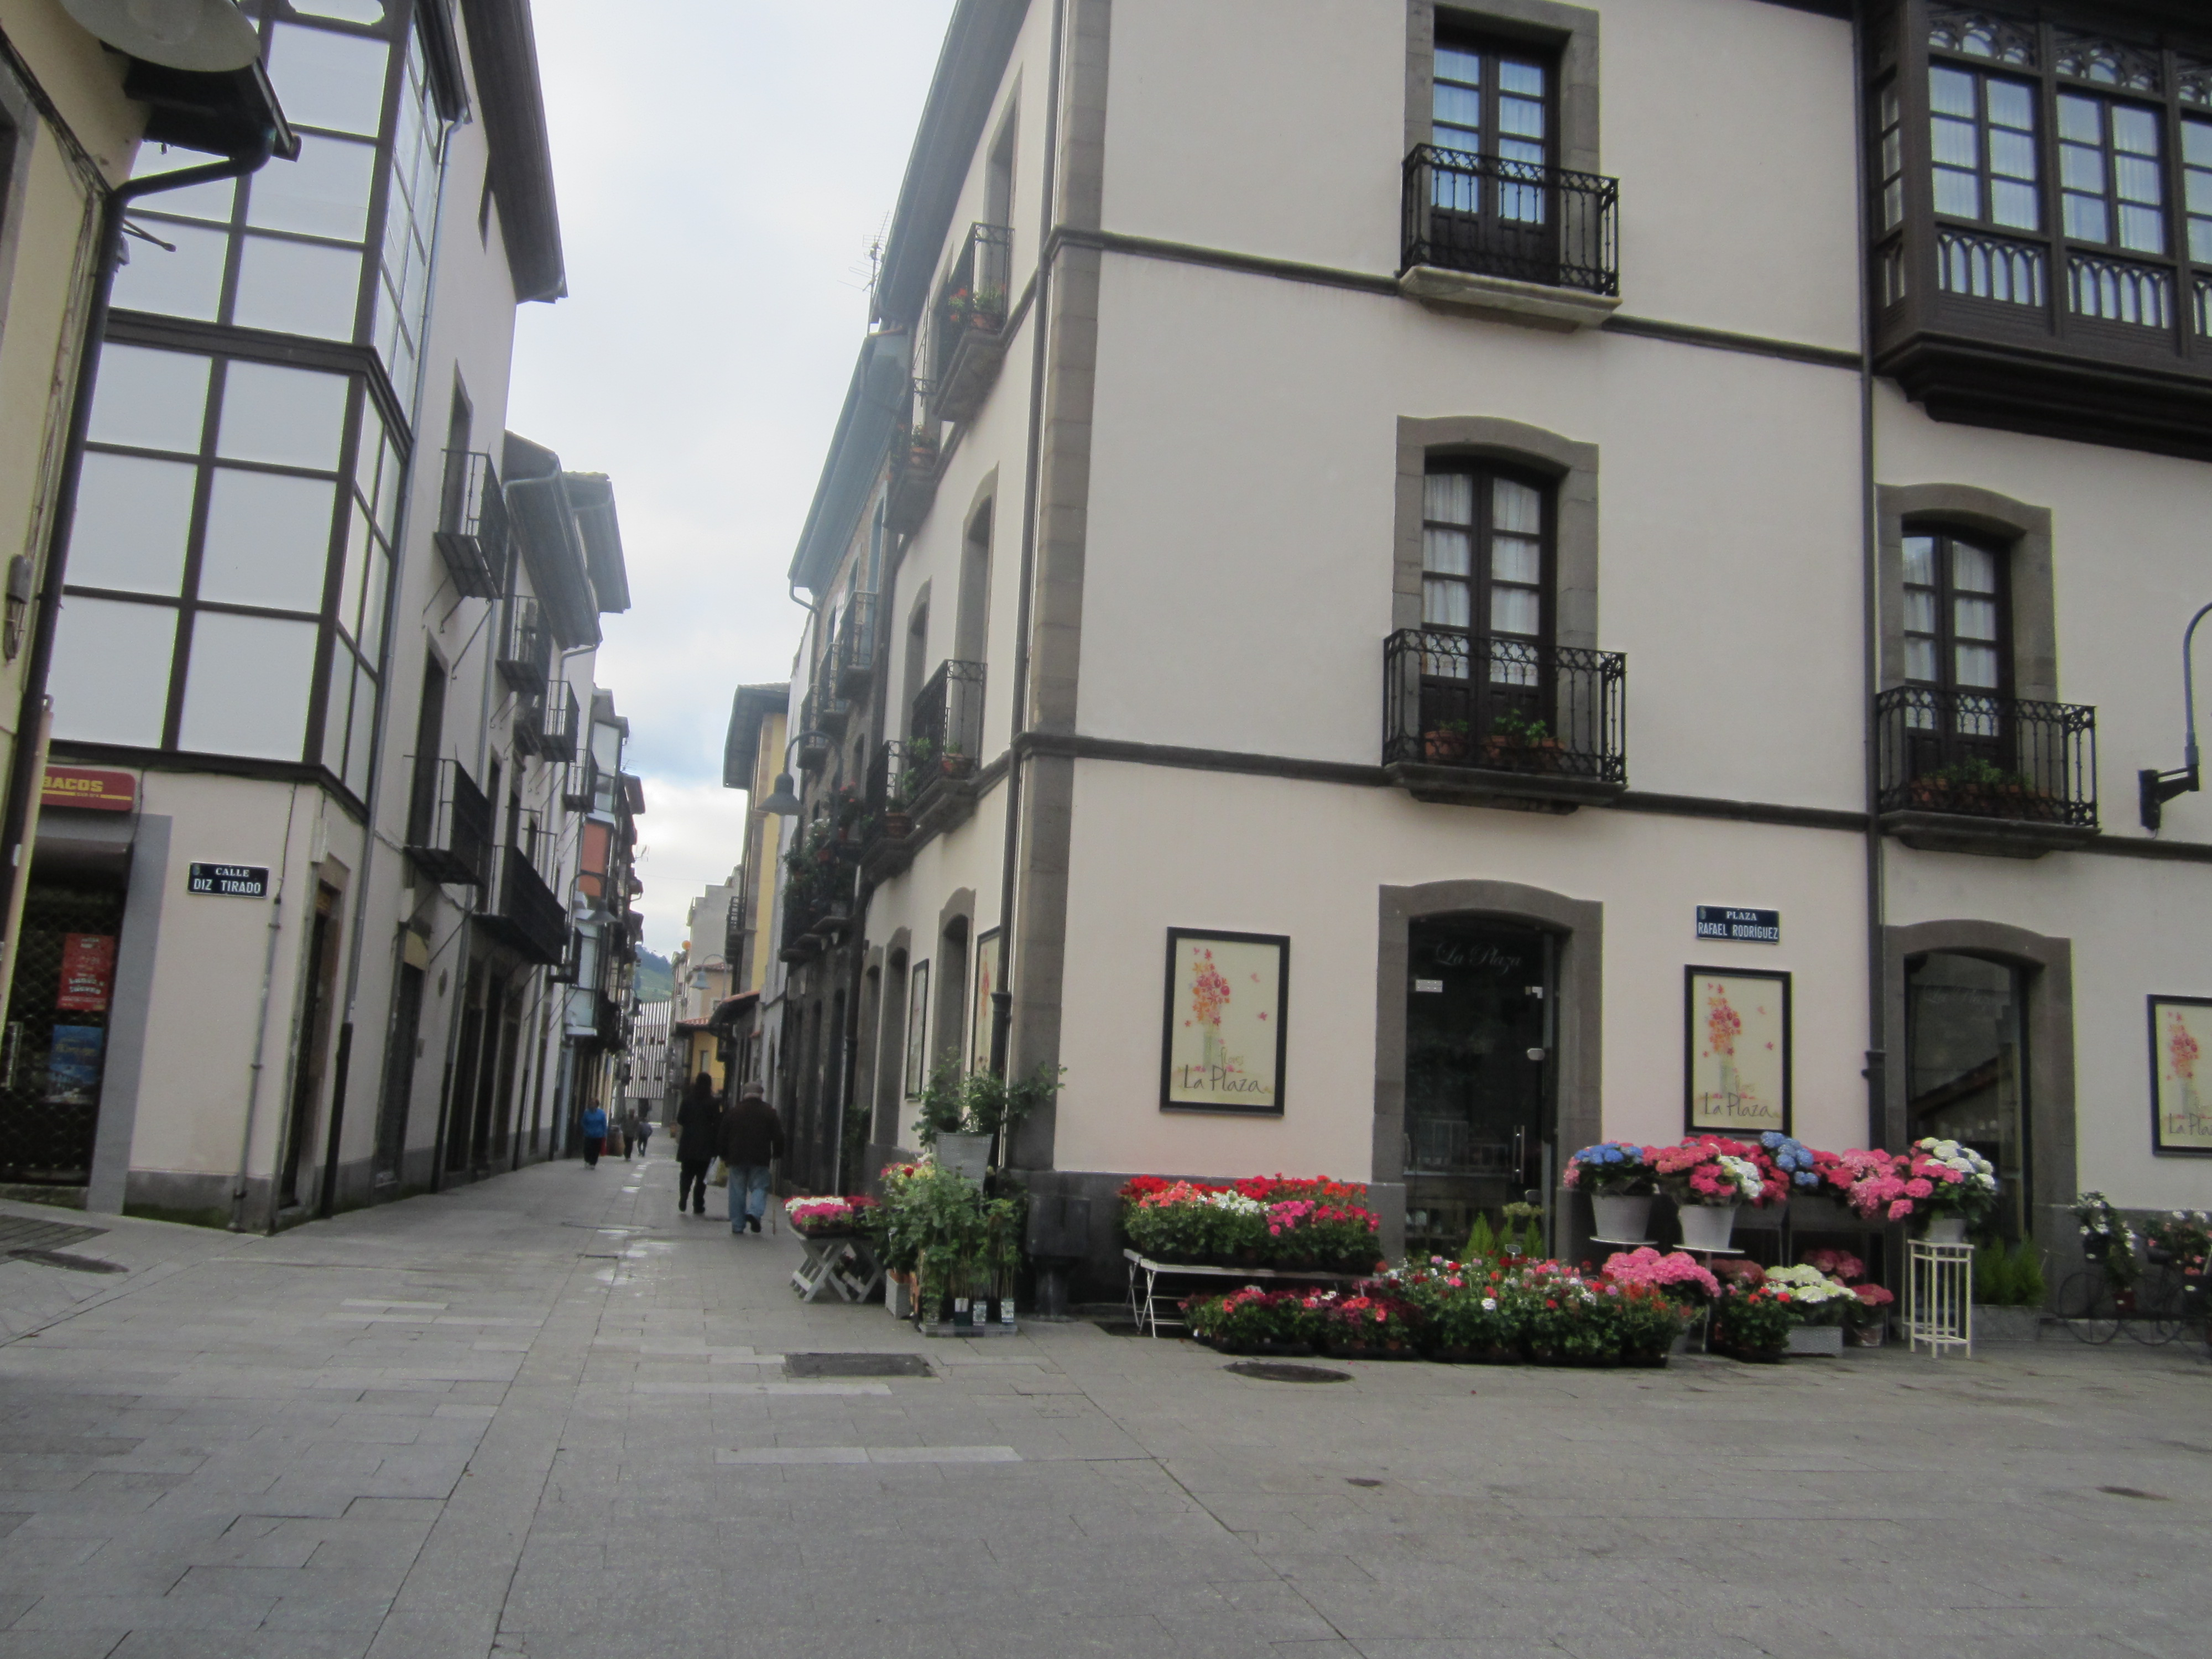 Floristería en Cangas del Narcea 985811511